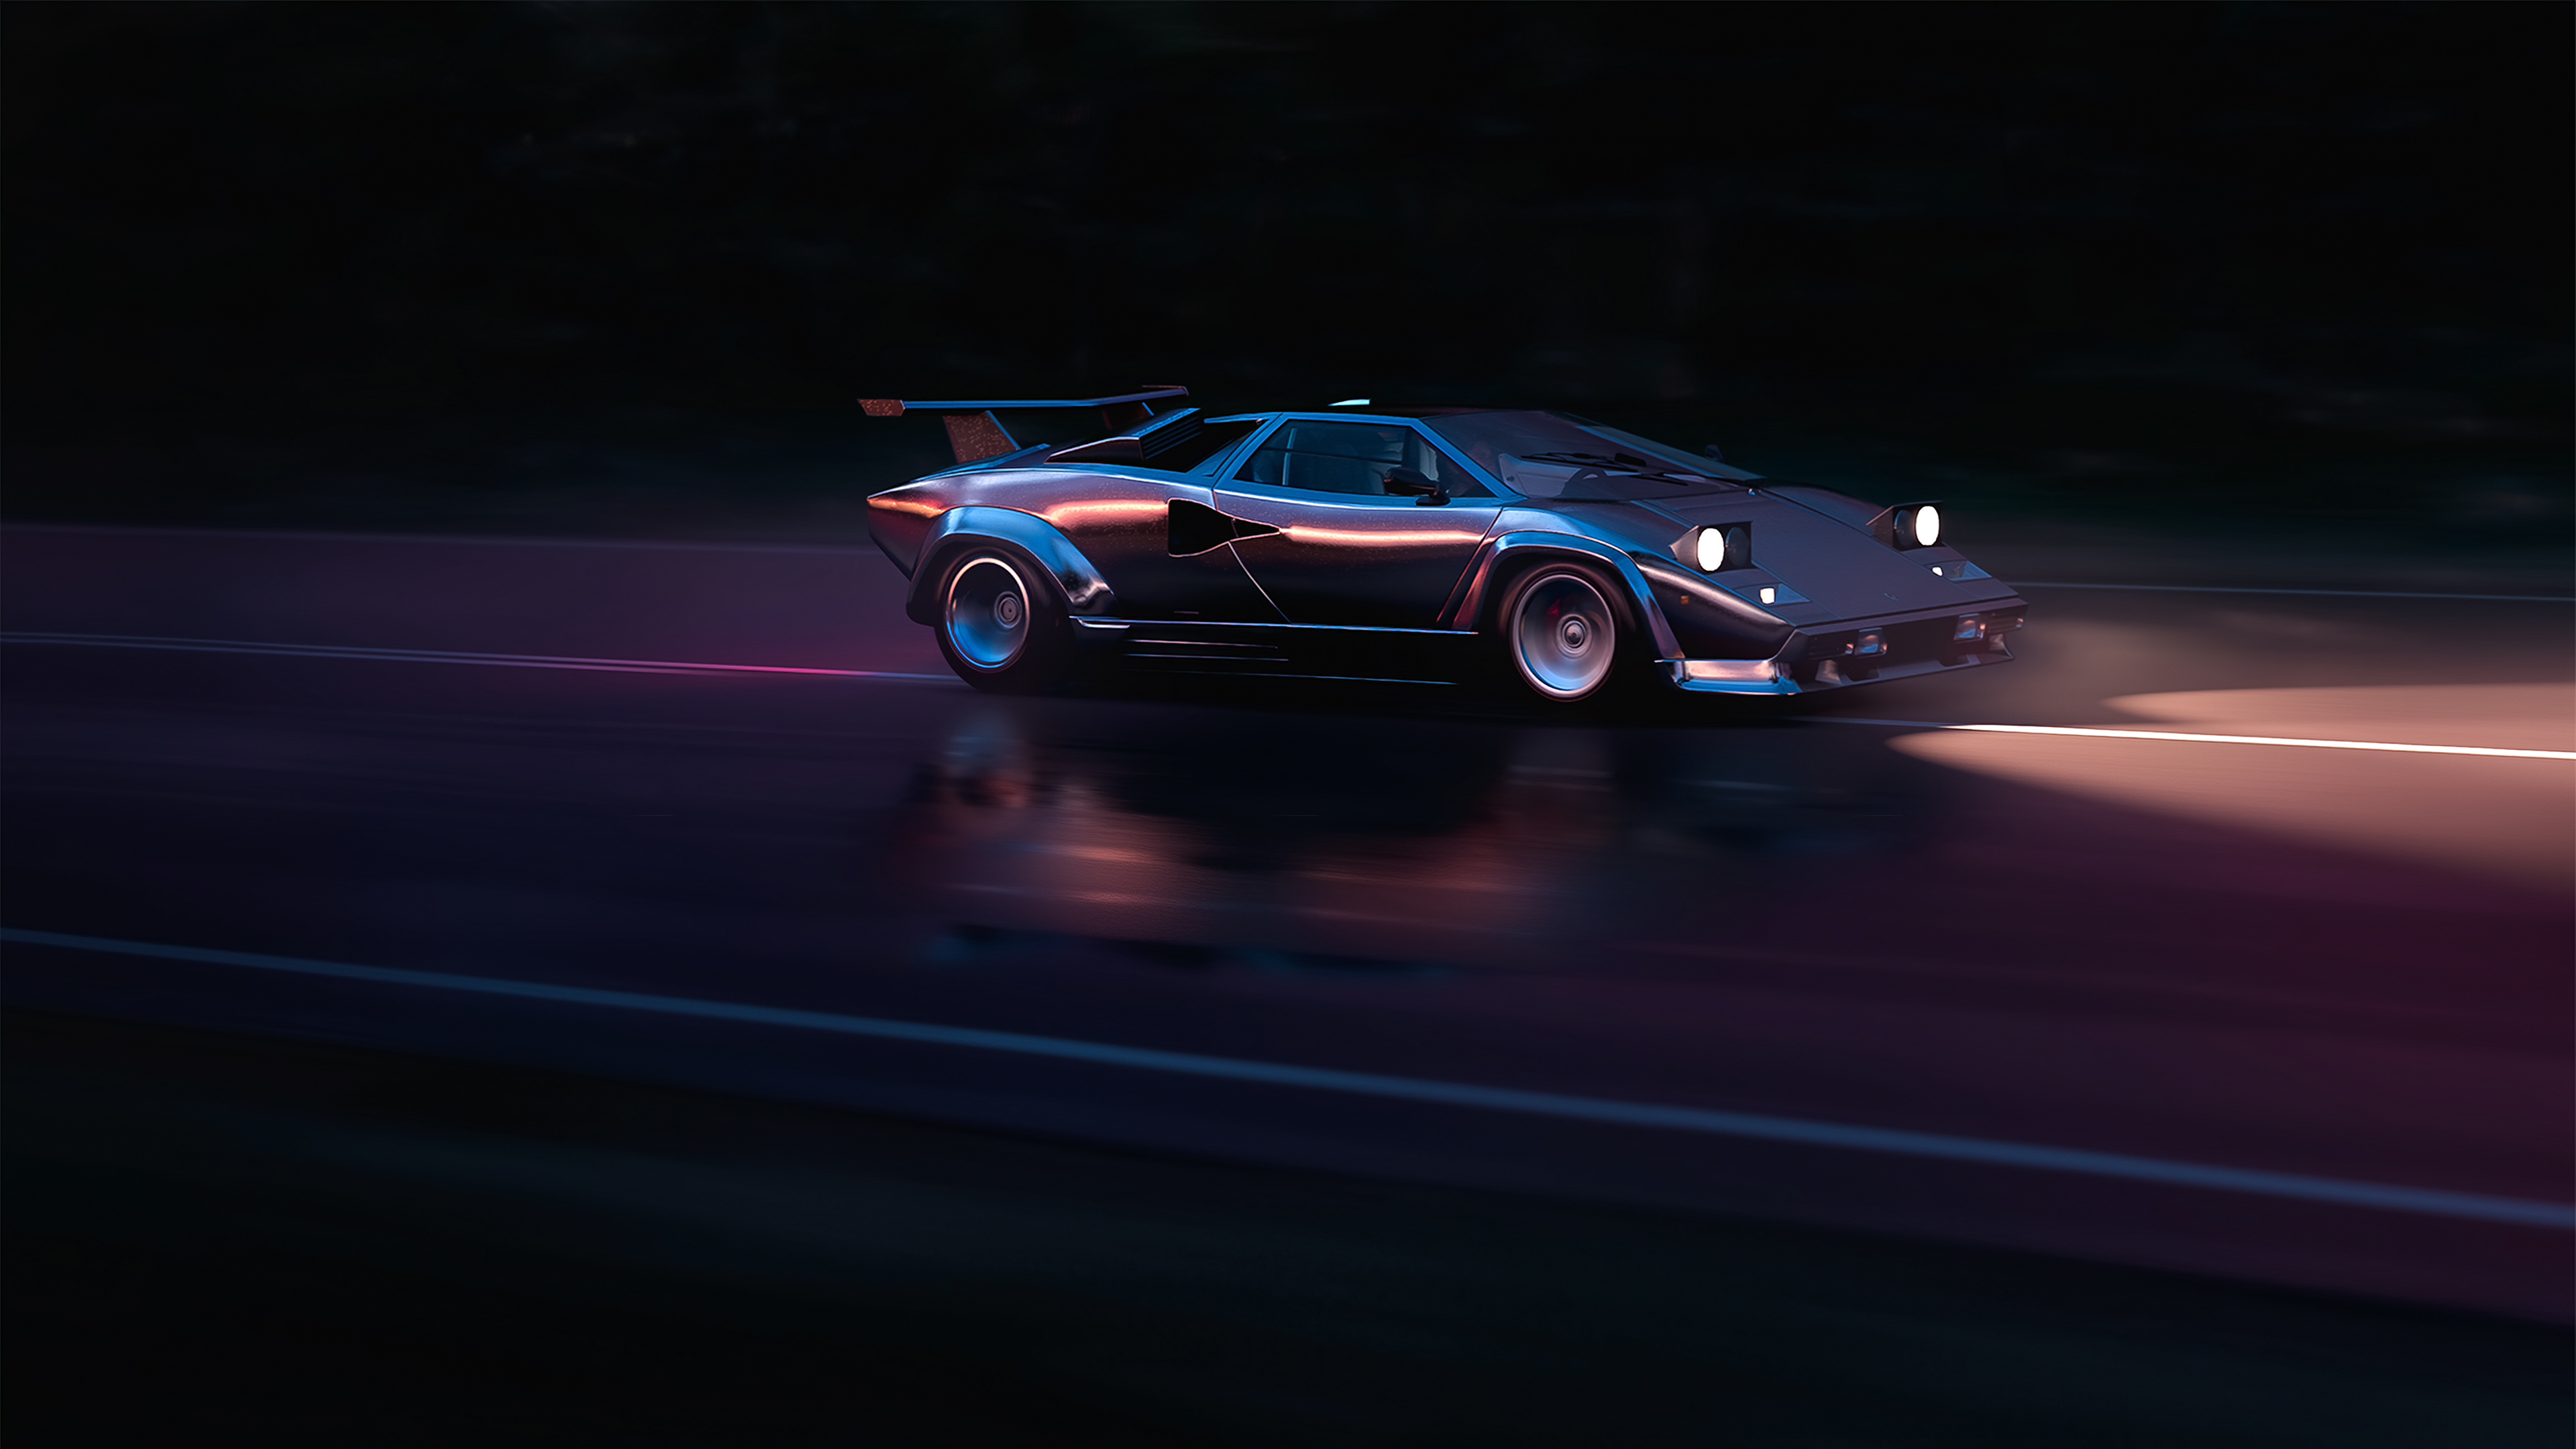 running in 80s lamborghini countach 4k 1554245204 - Running In 80s Lamborghini Countach 4k - lamborghini wallpapers, hd-wallpapers, cars wallpapers, 4k-wallpapers